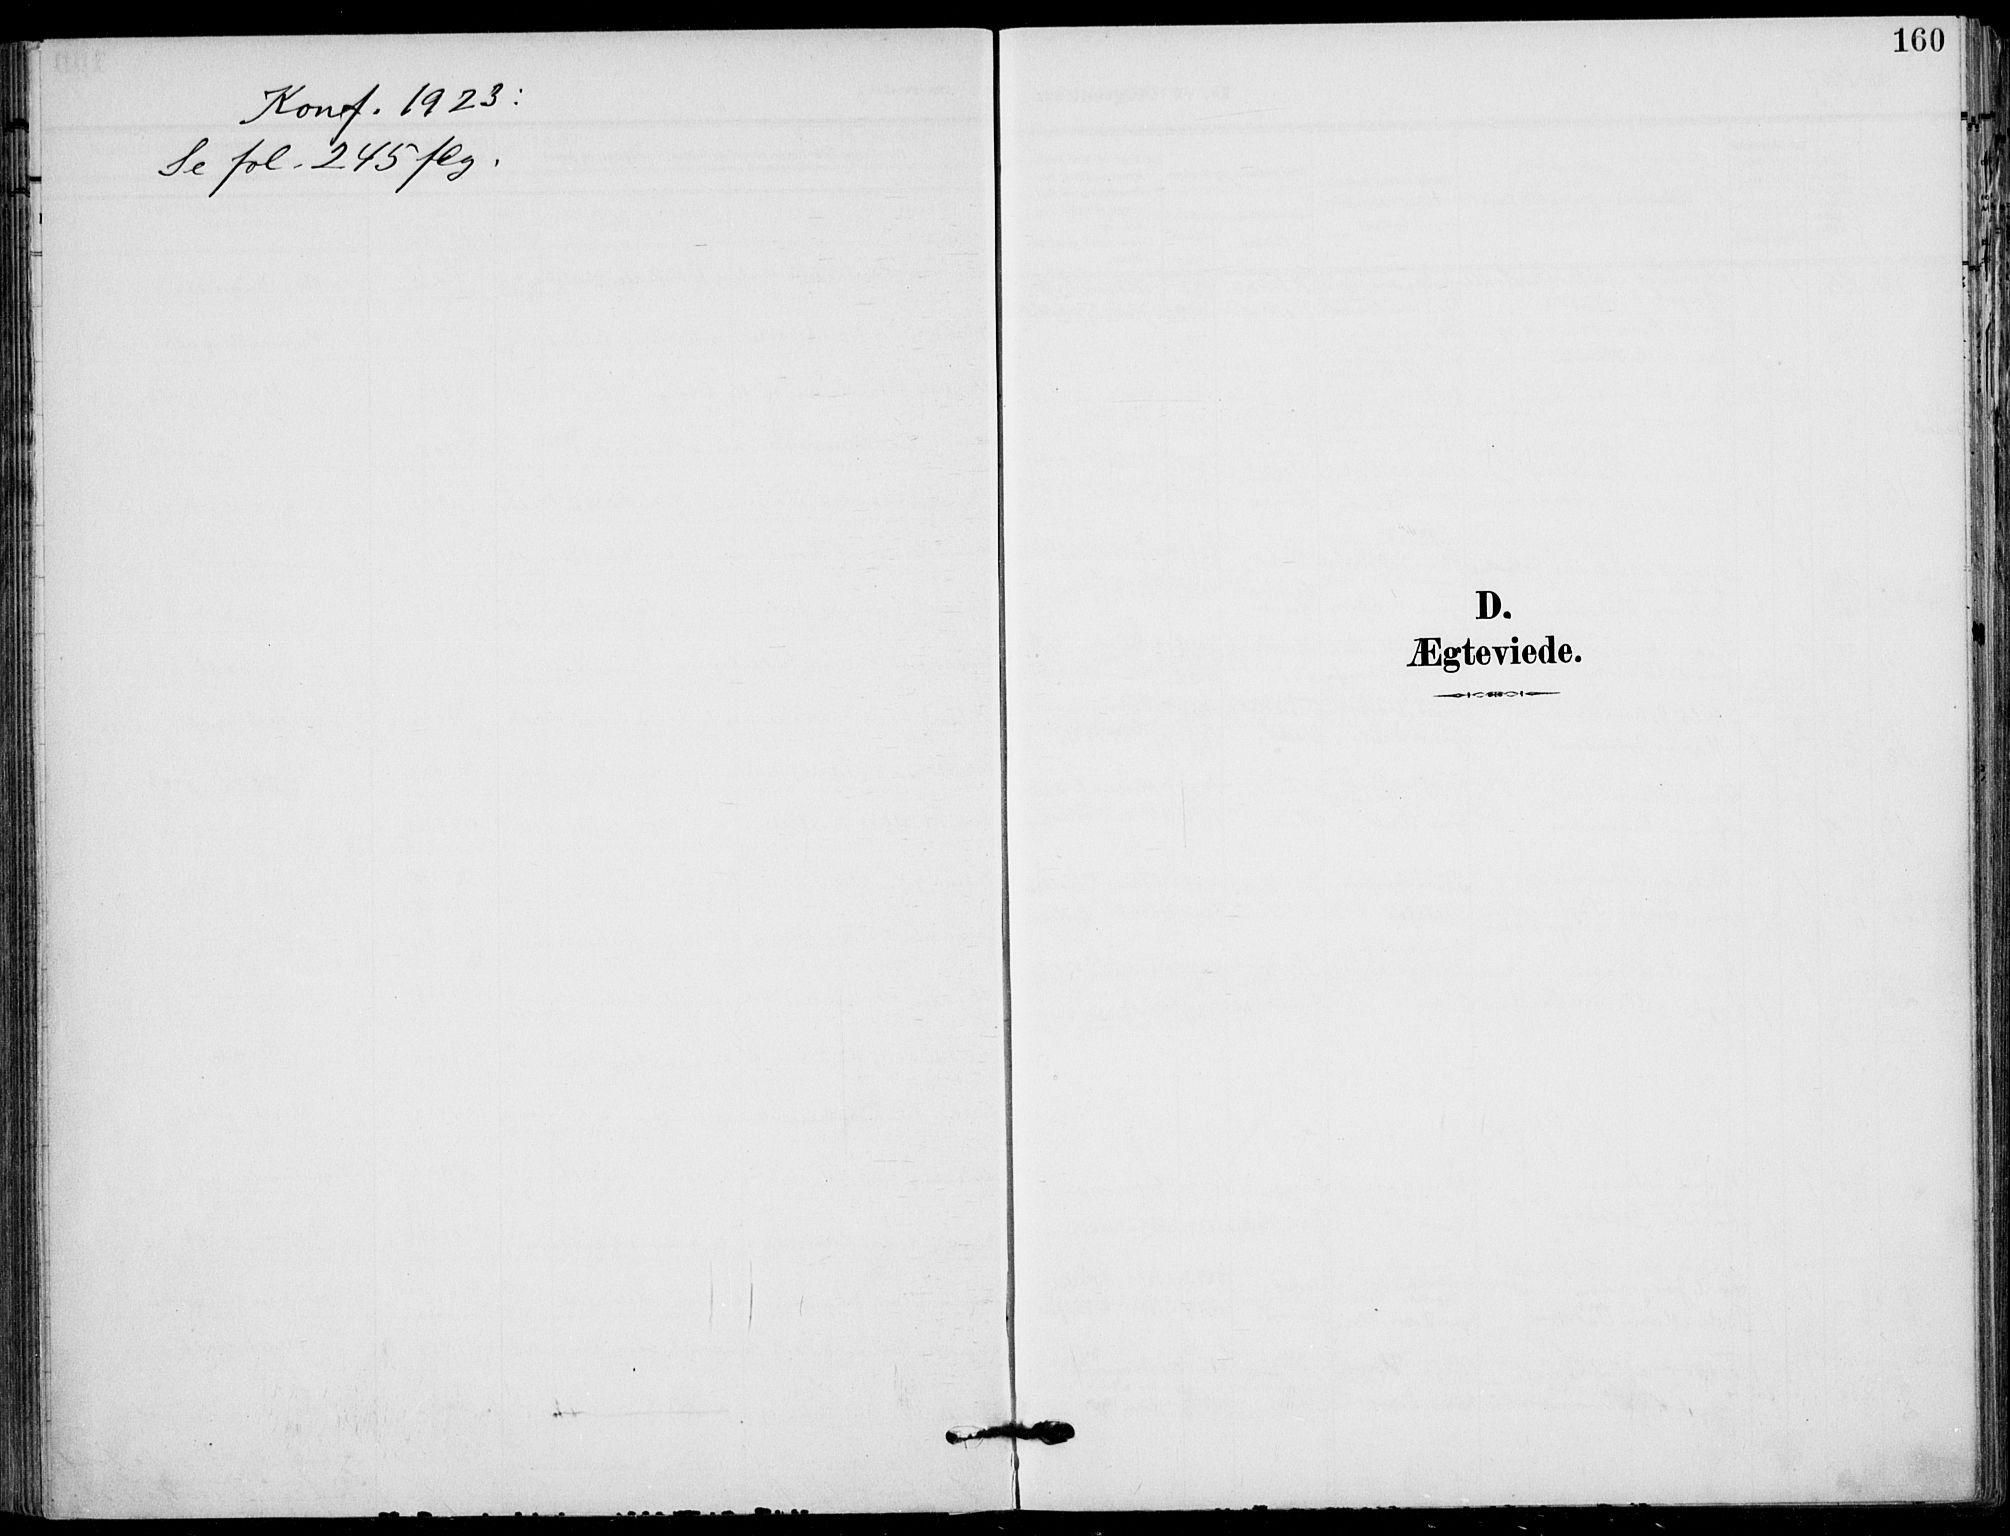 SAKO, Holla kirkebøker, F/Fa/L0012: Ministerialbok nr. 12, 1907-1923, s. 160